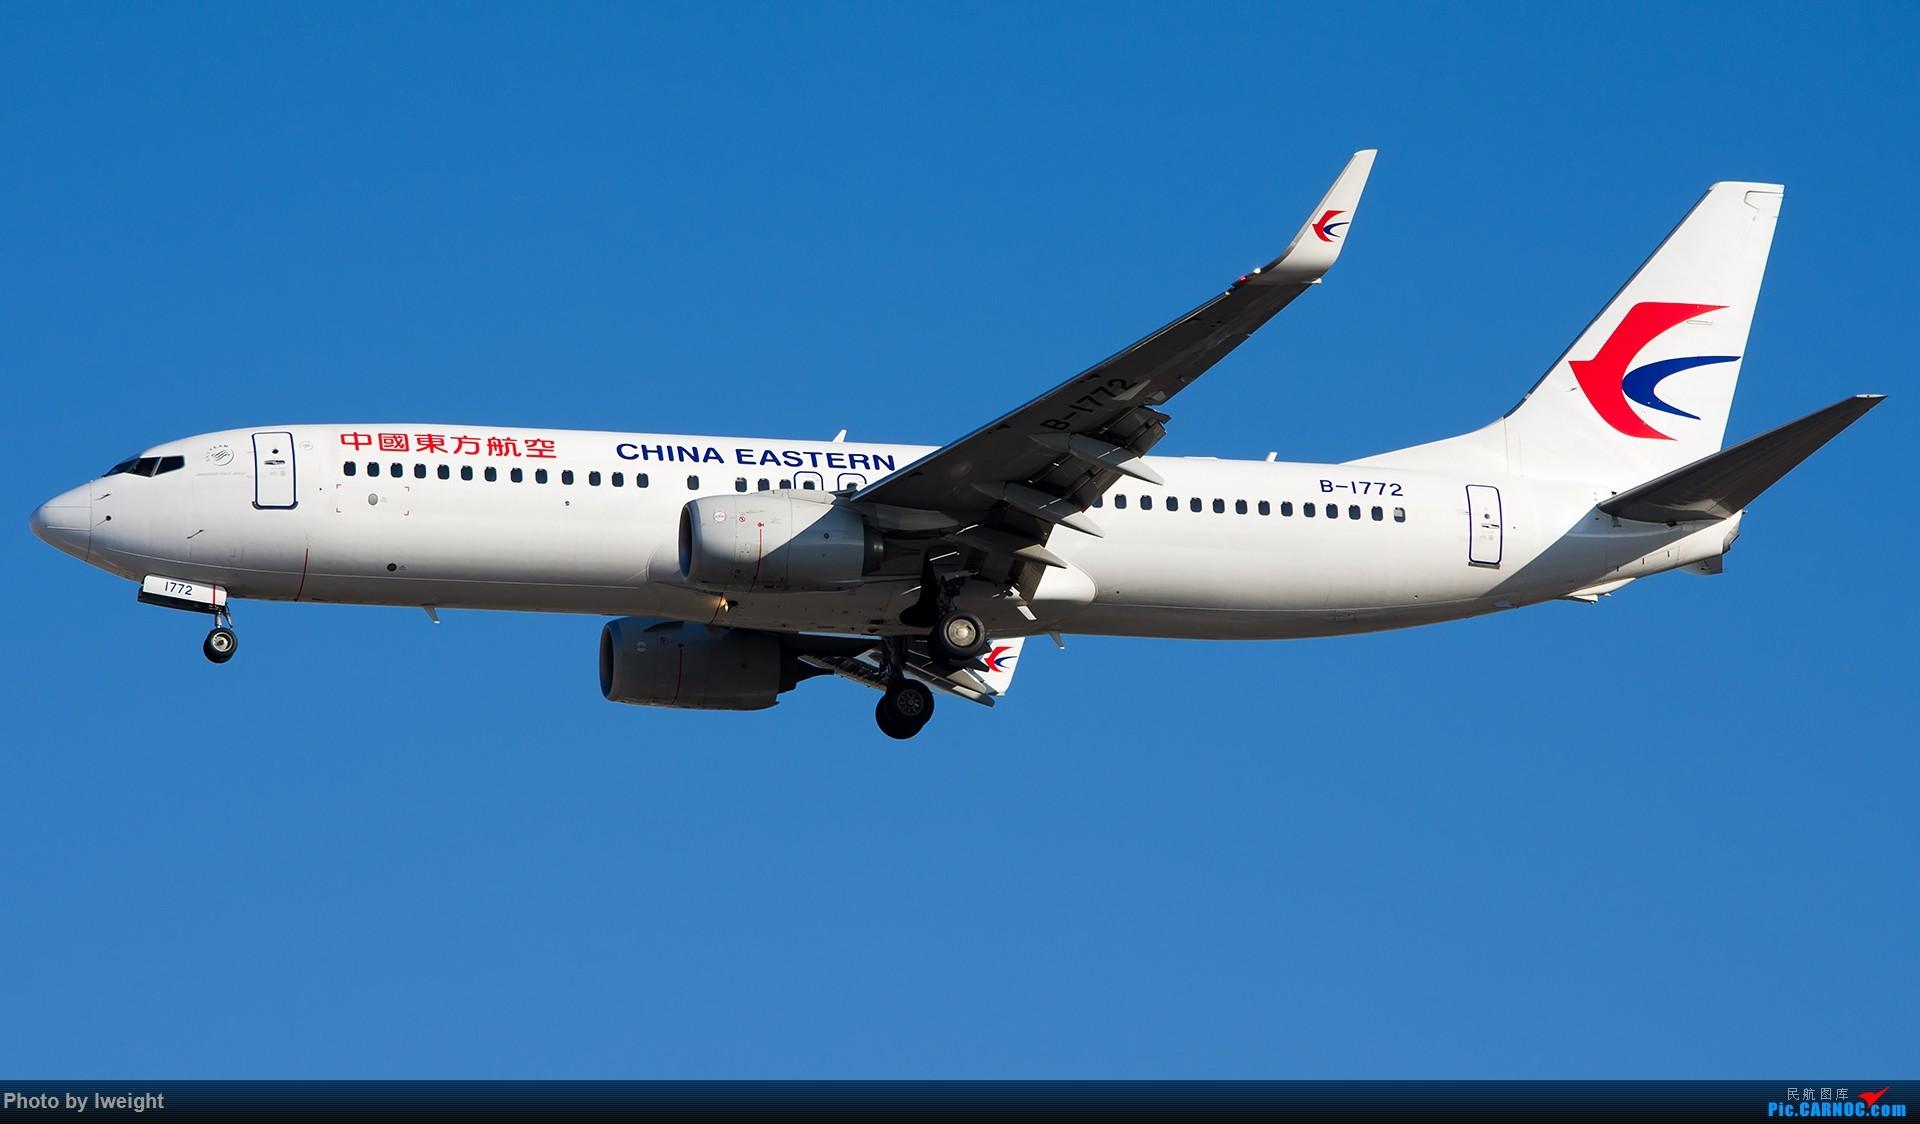 Re:[原创]终于在12月的北京等到了一个晴天的周末,出来拍拍飞机【2015-12-5】 BOEING 737-800 B-1772 中国北京首都国际机场